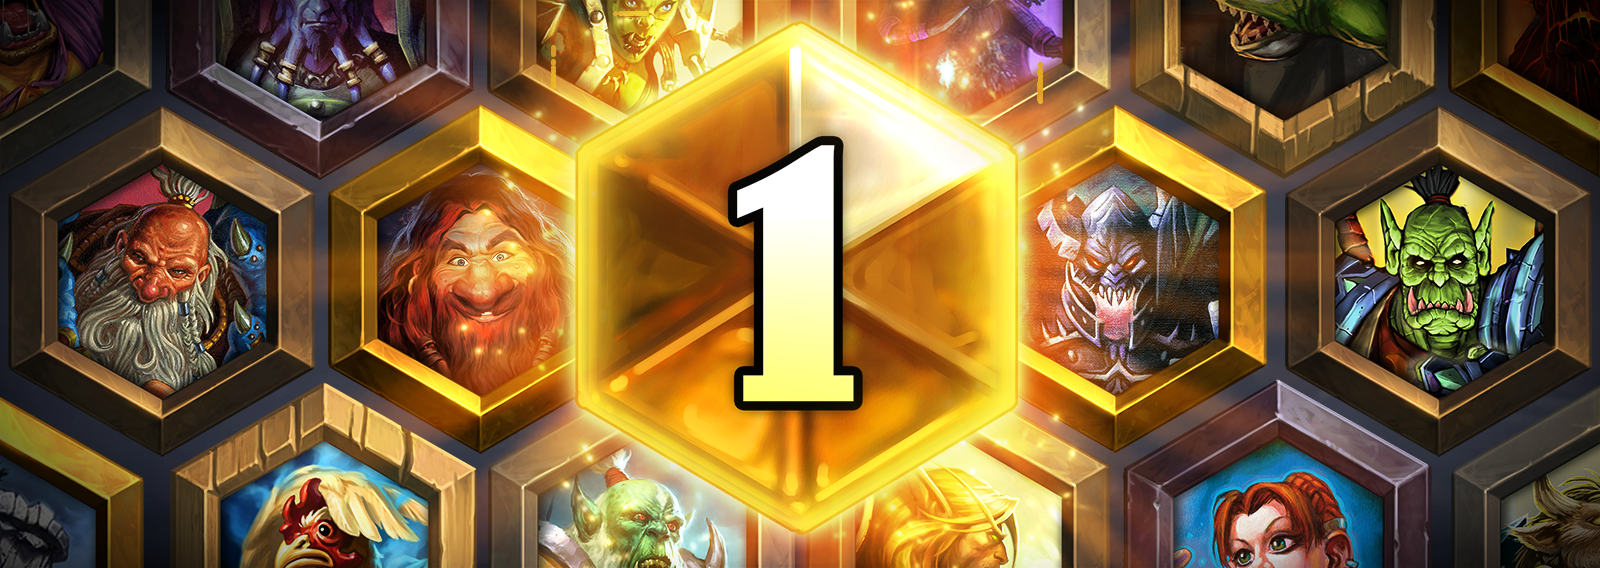 Warrior card rankings hearthstone download